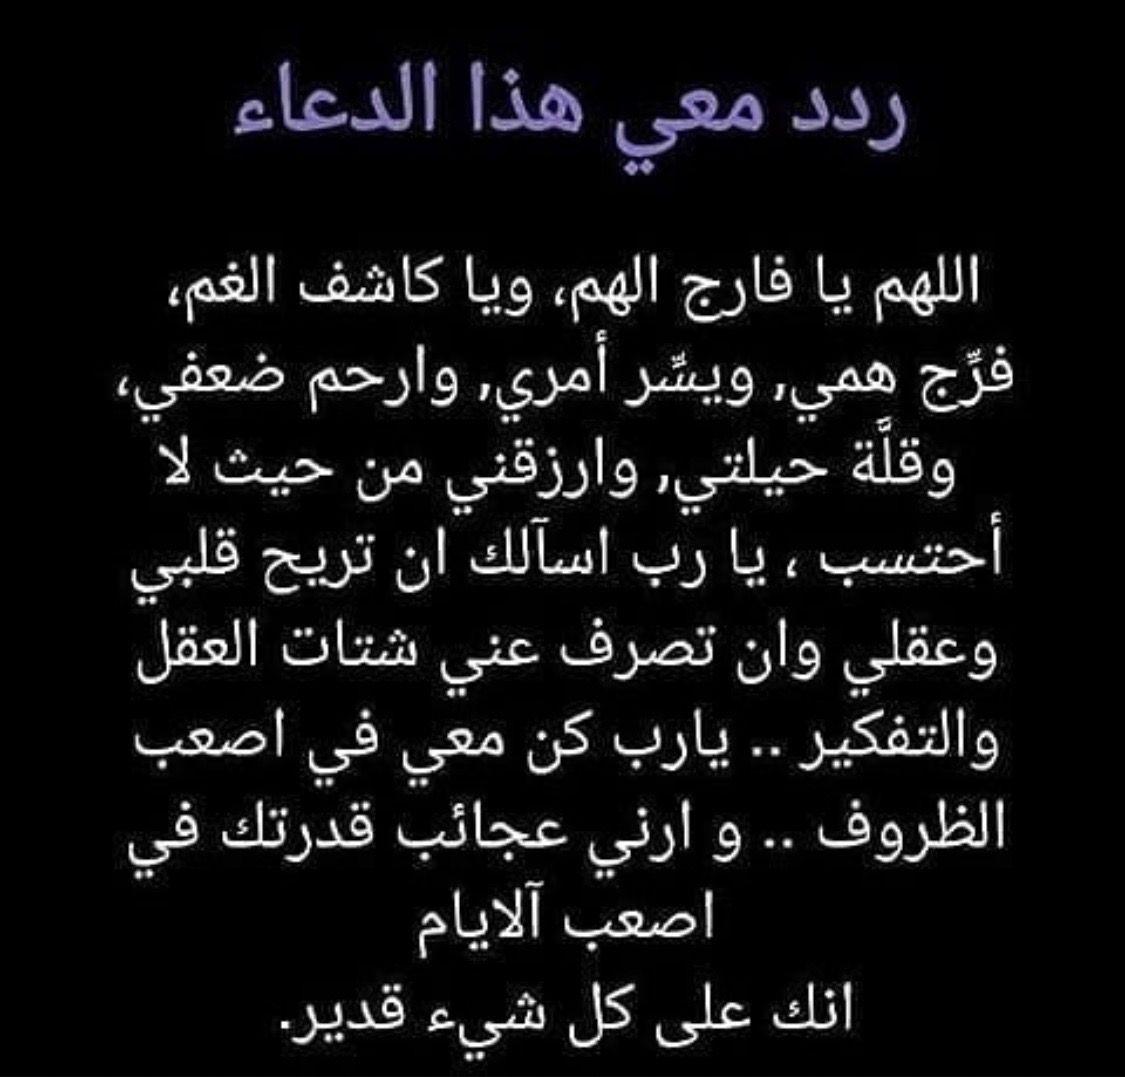 Pin By Wejdan Ali On ادعية Math Duaa Islam Math Equations